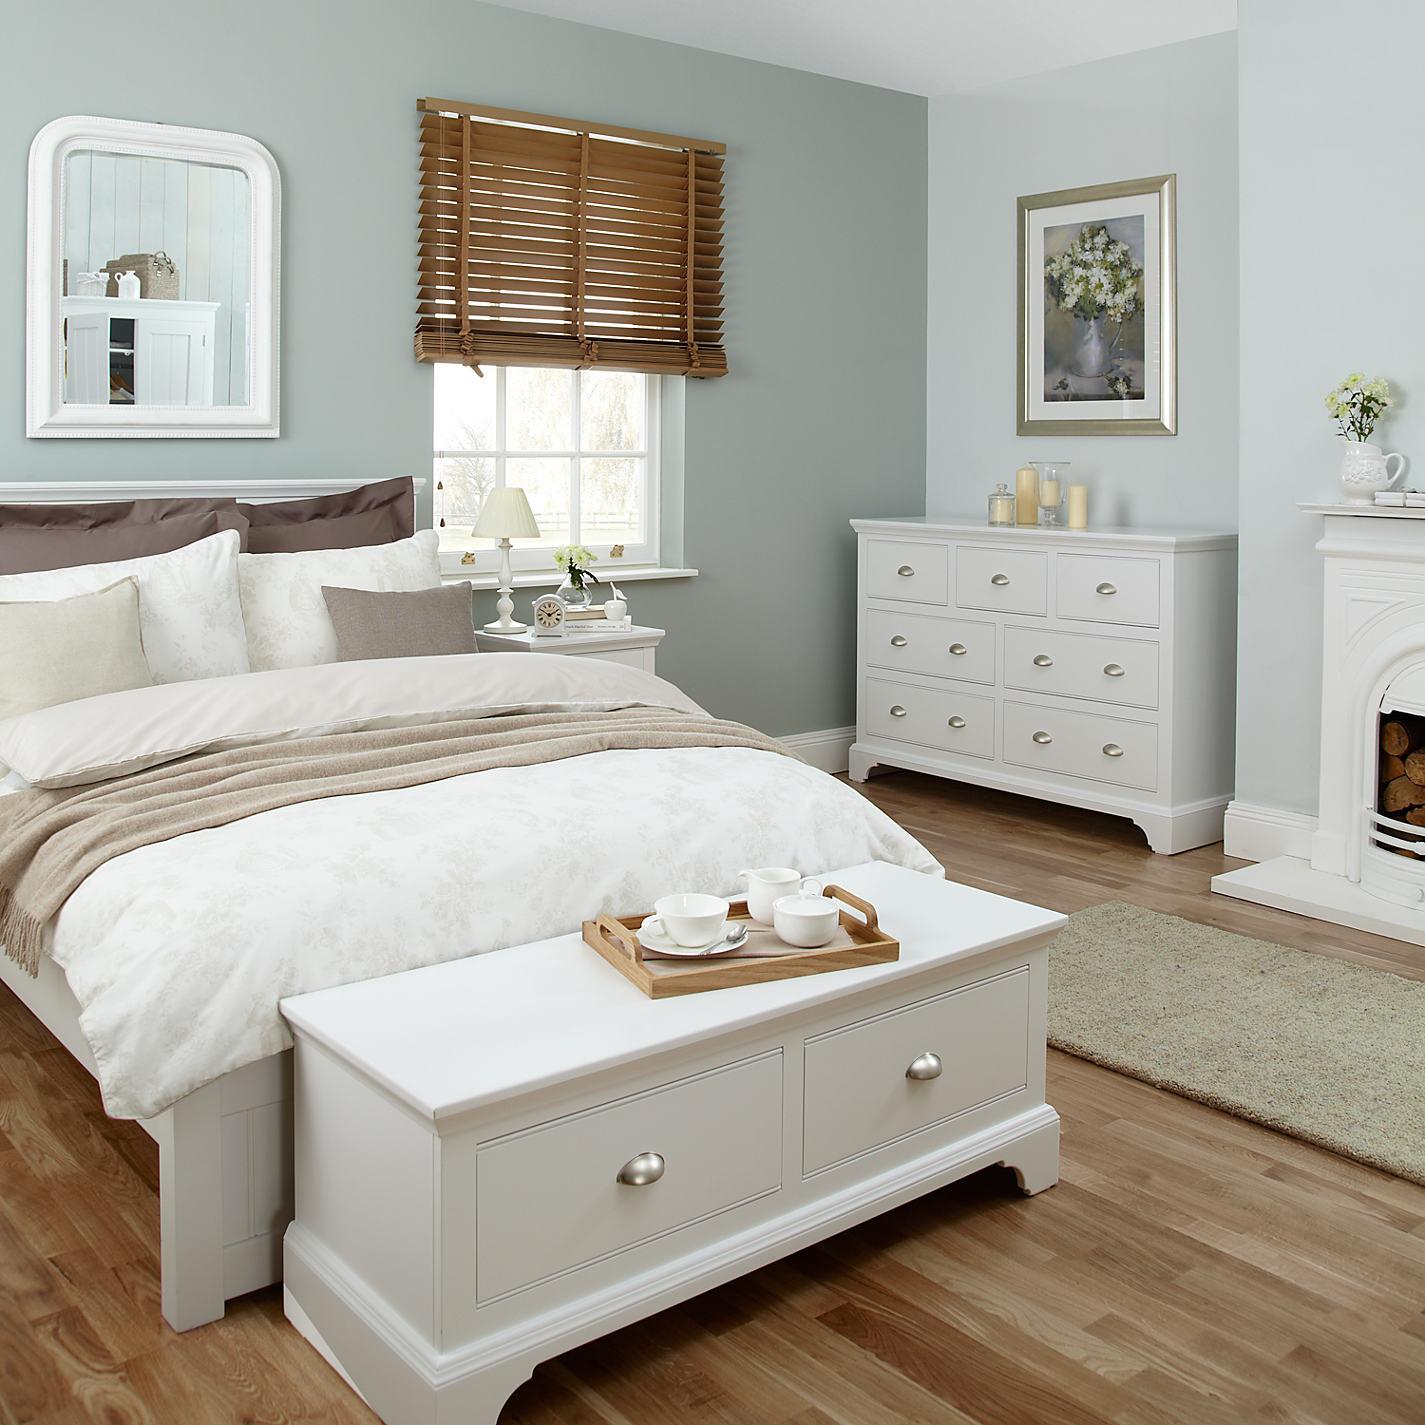 John lewis childrens bedroom furniture - Bedroom Furniture John Lewis Themayohome Com